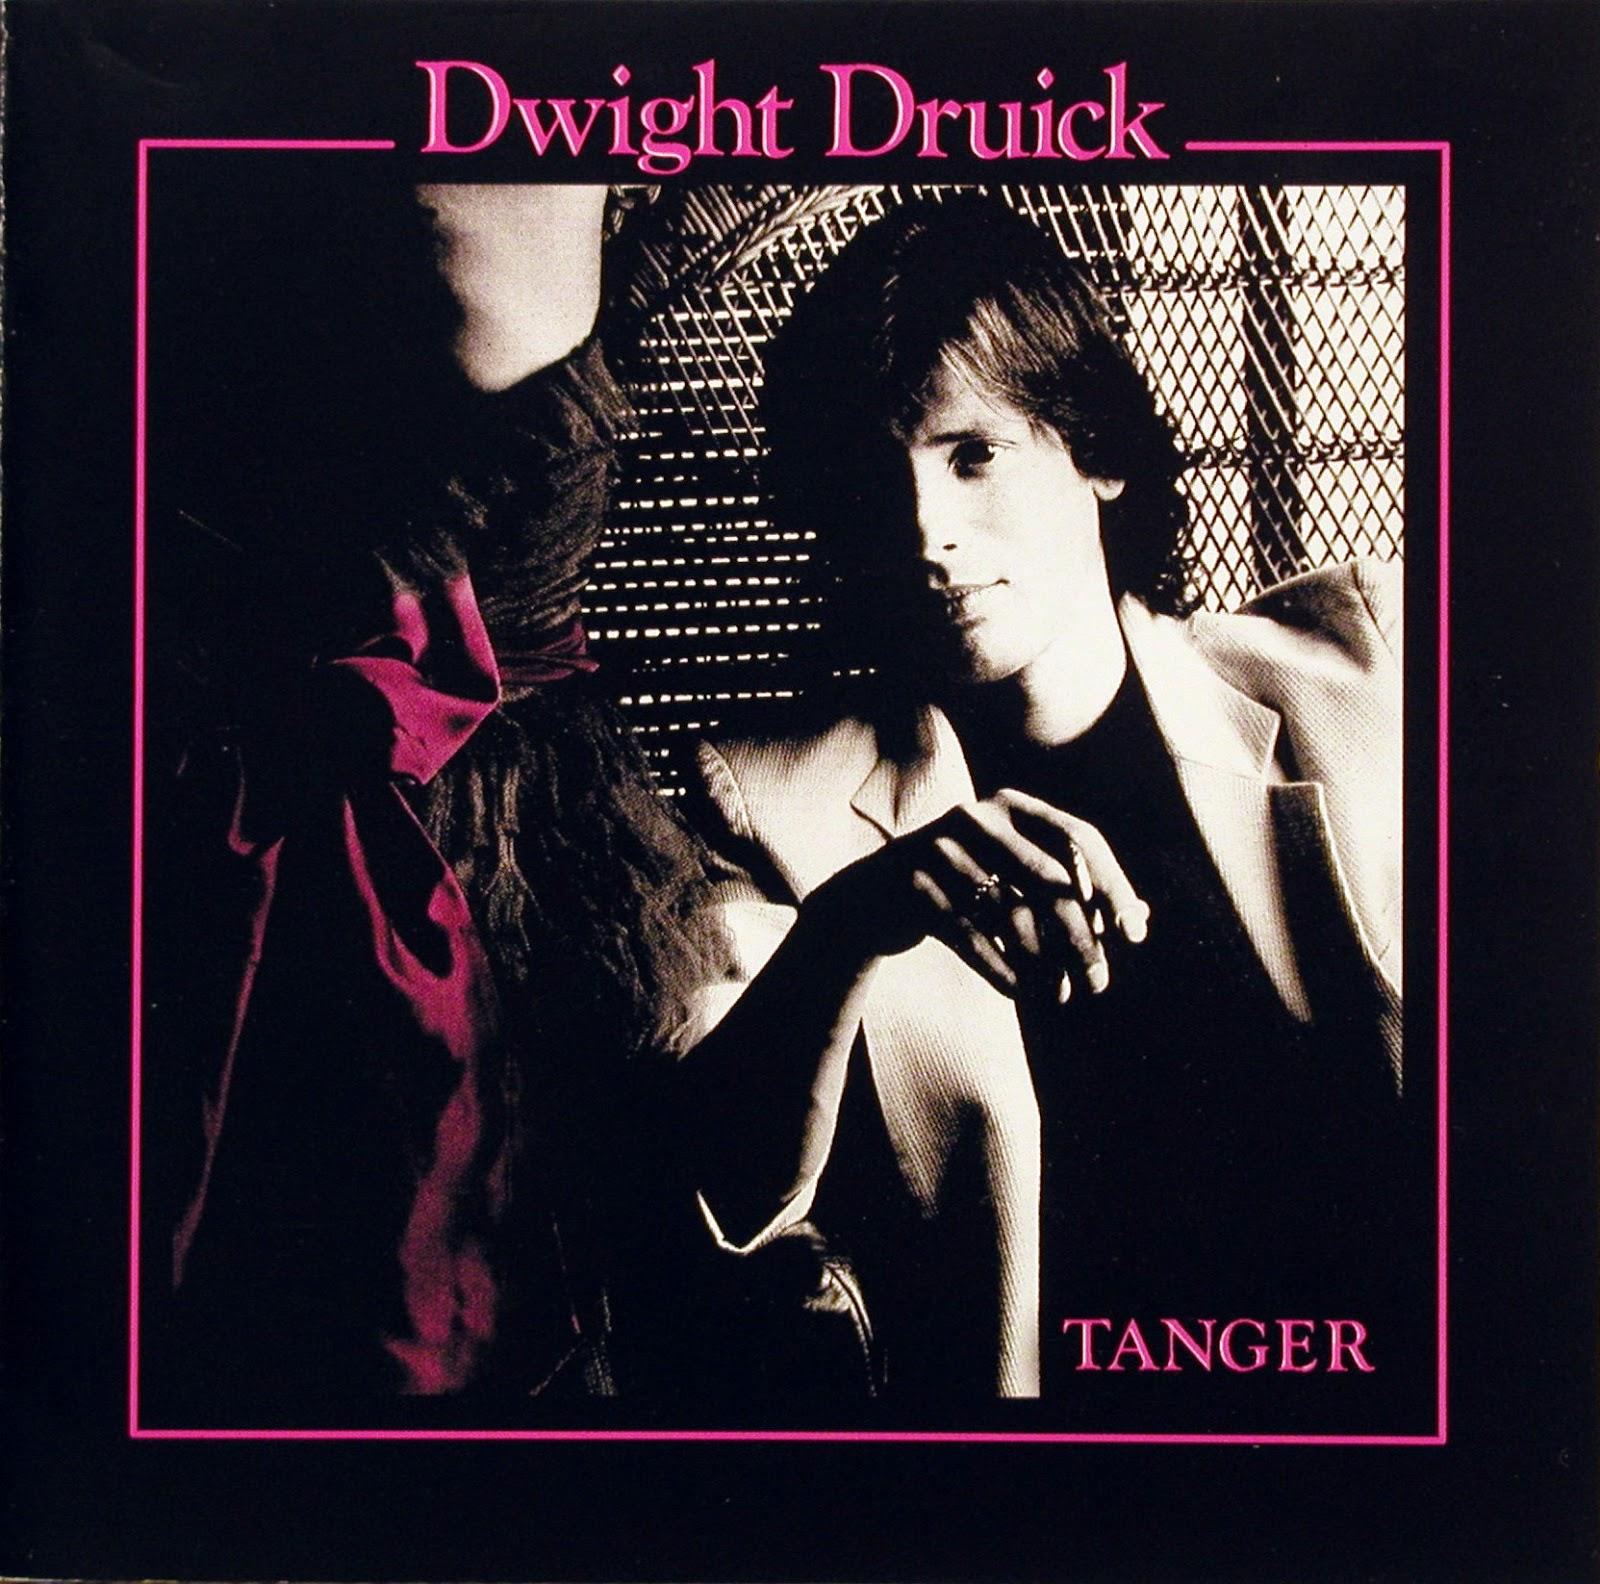 Dwight Druick Tanger